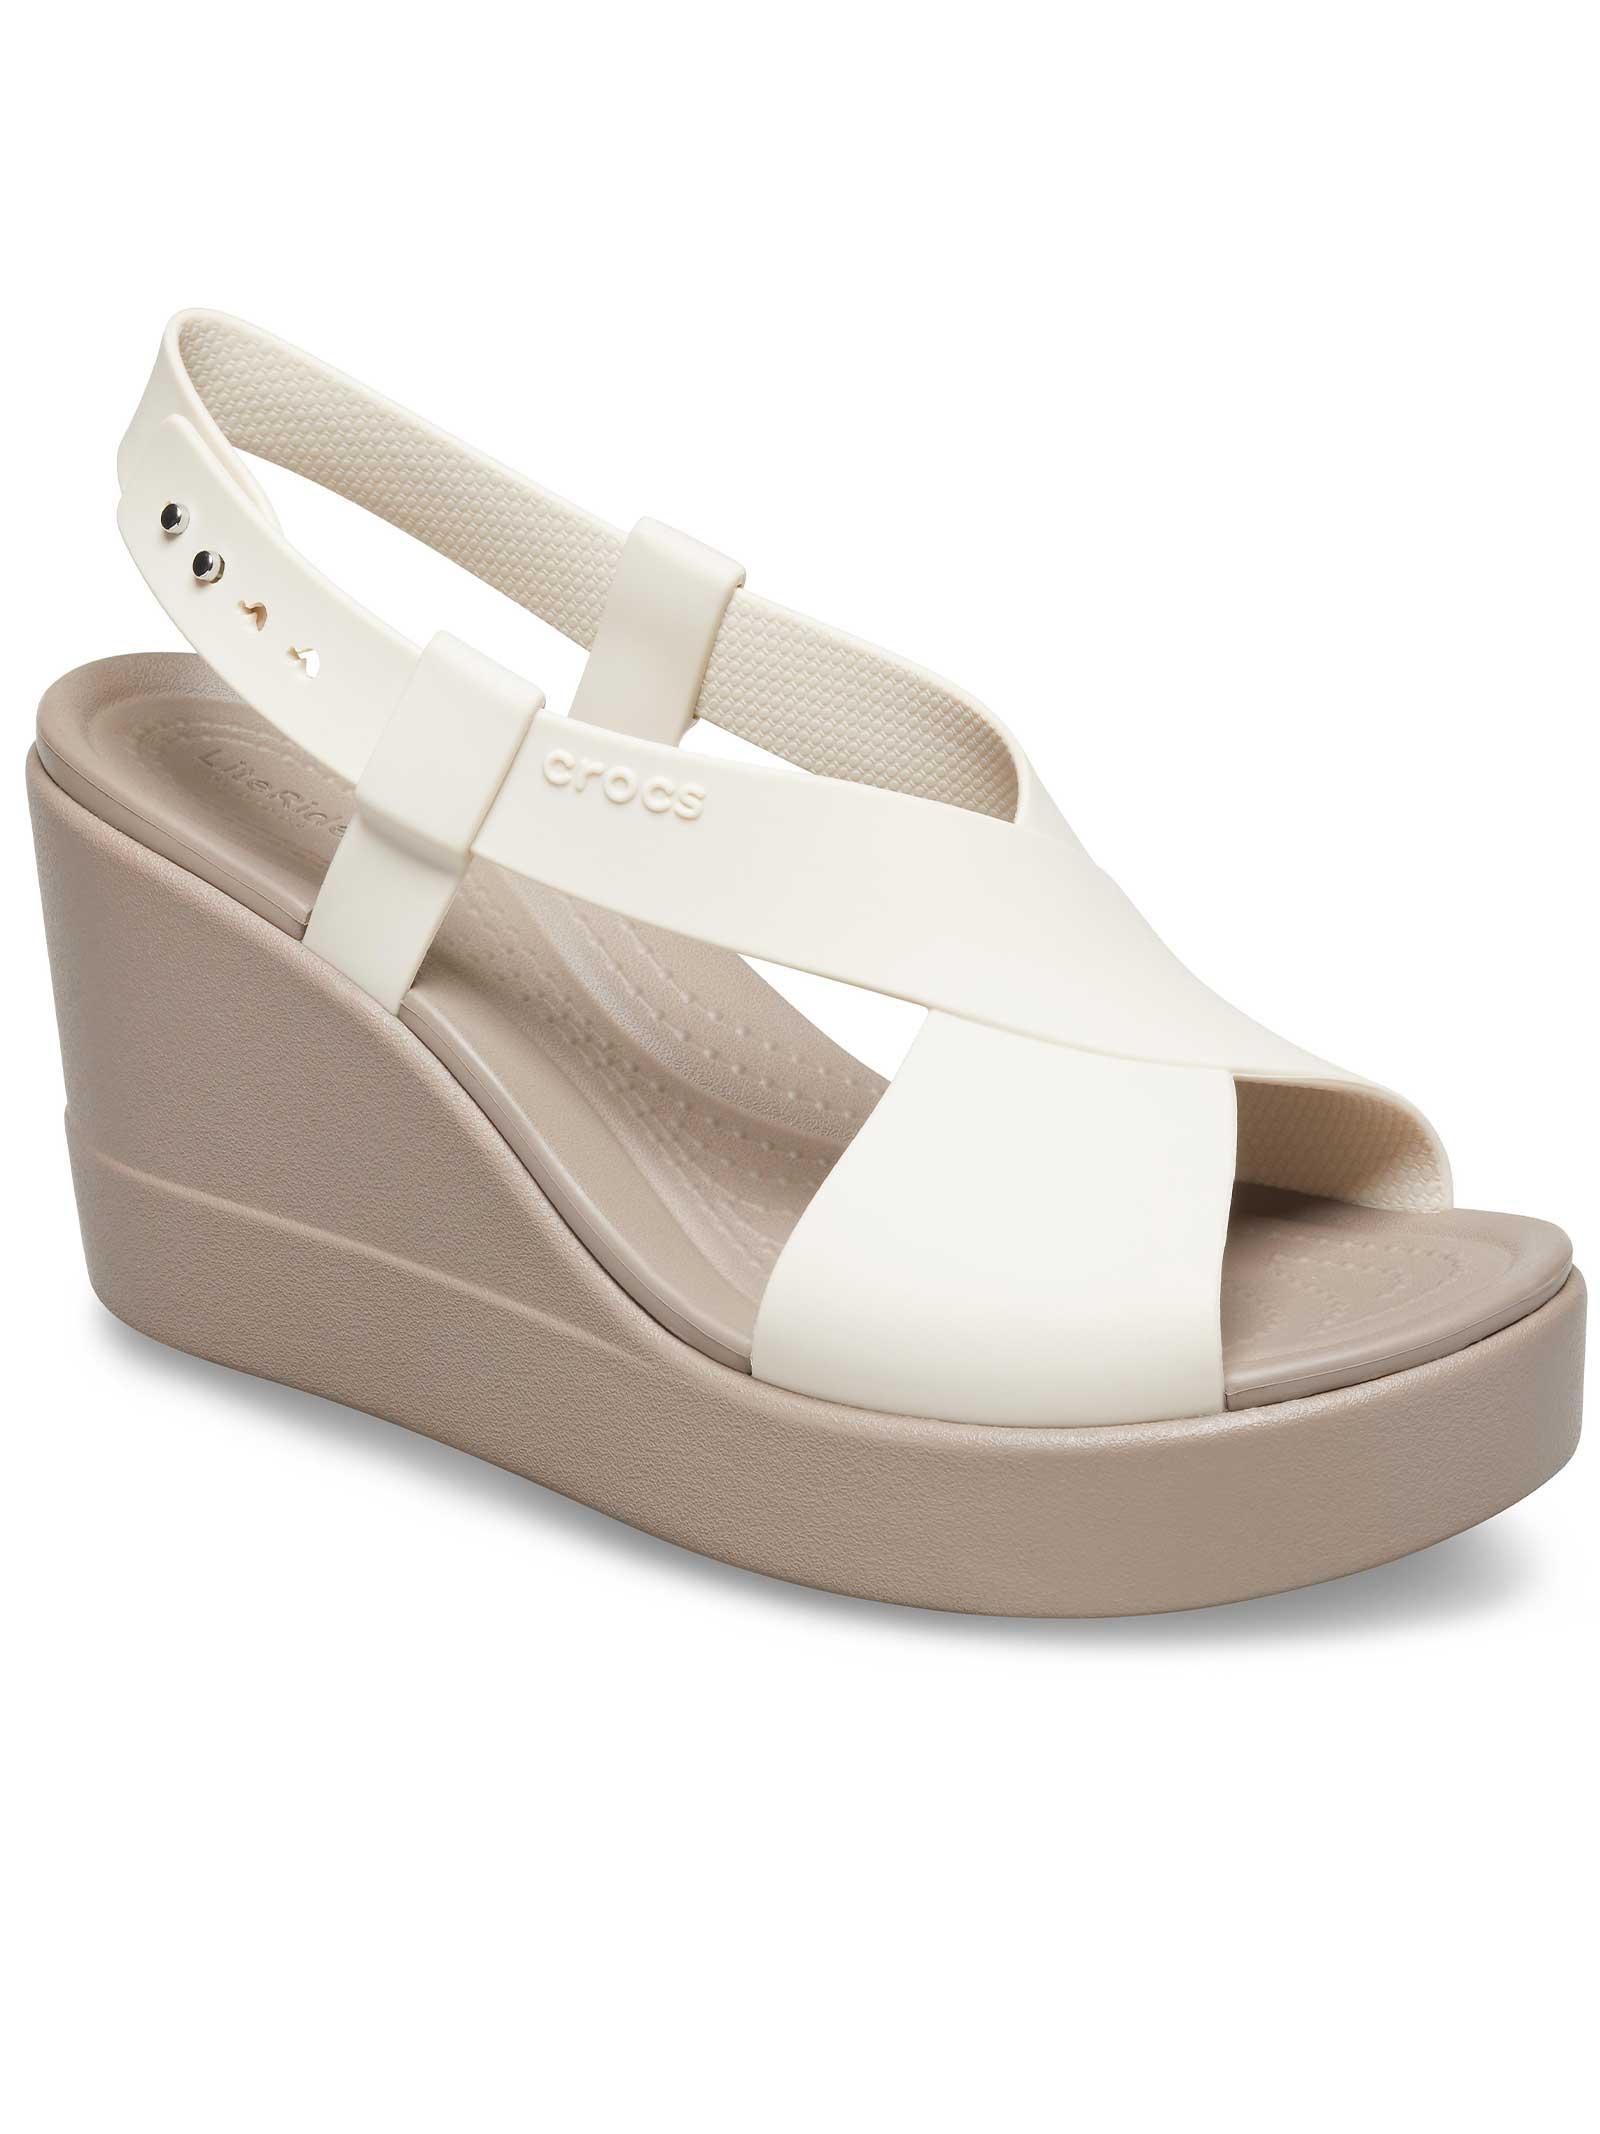 SANDALO DONNA CROCS   Sandalo   20622216T